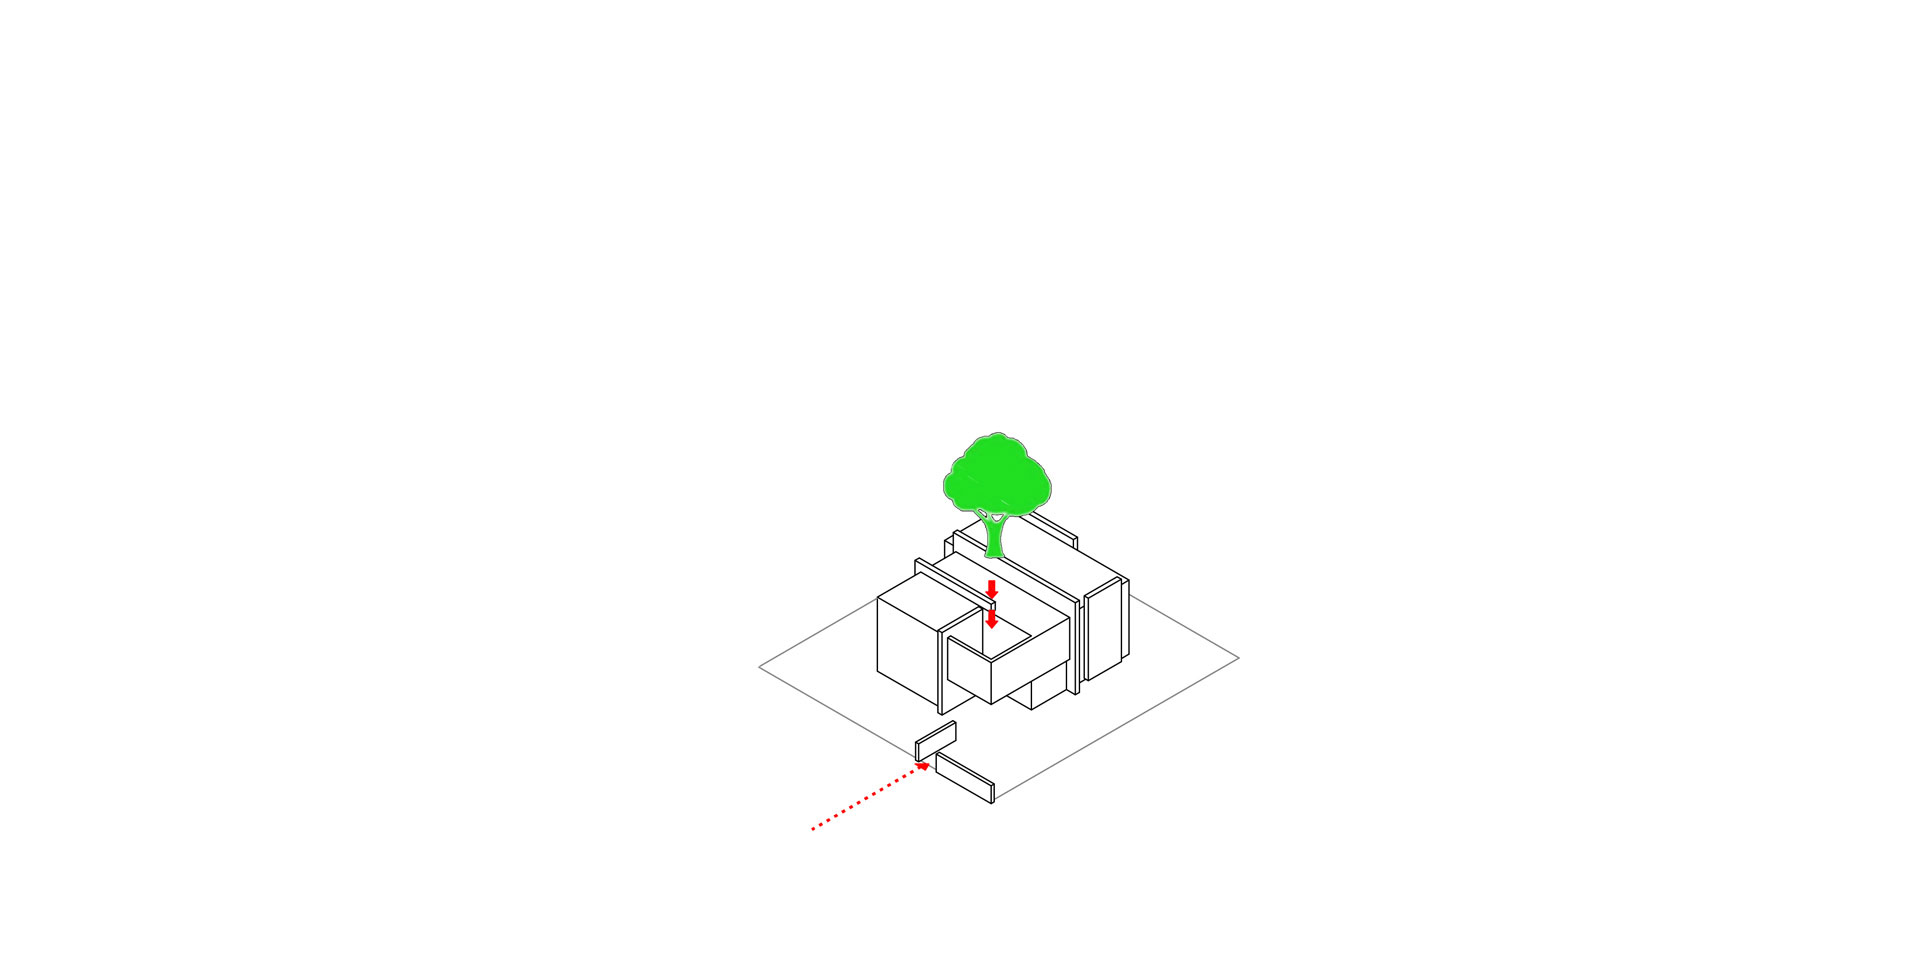 archinow_PYR_residenza-privata_08